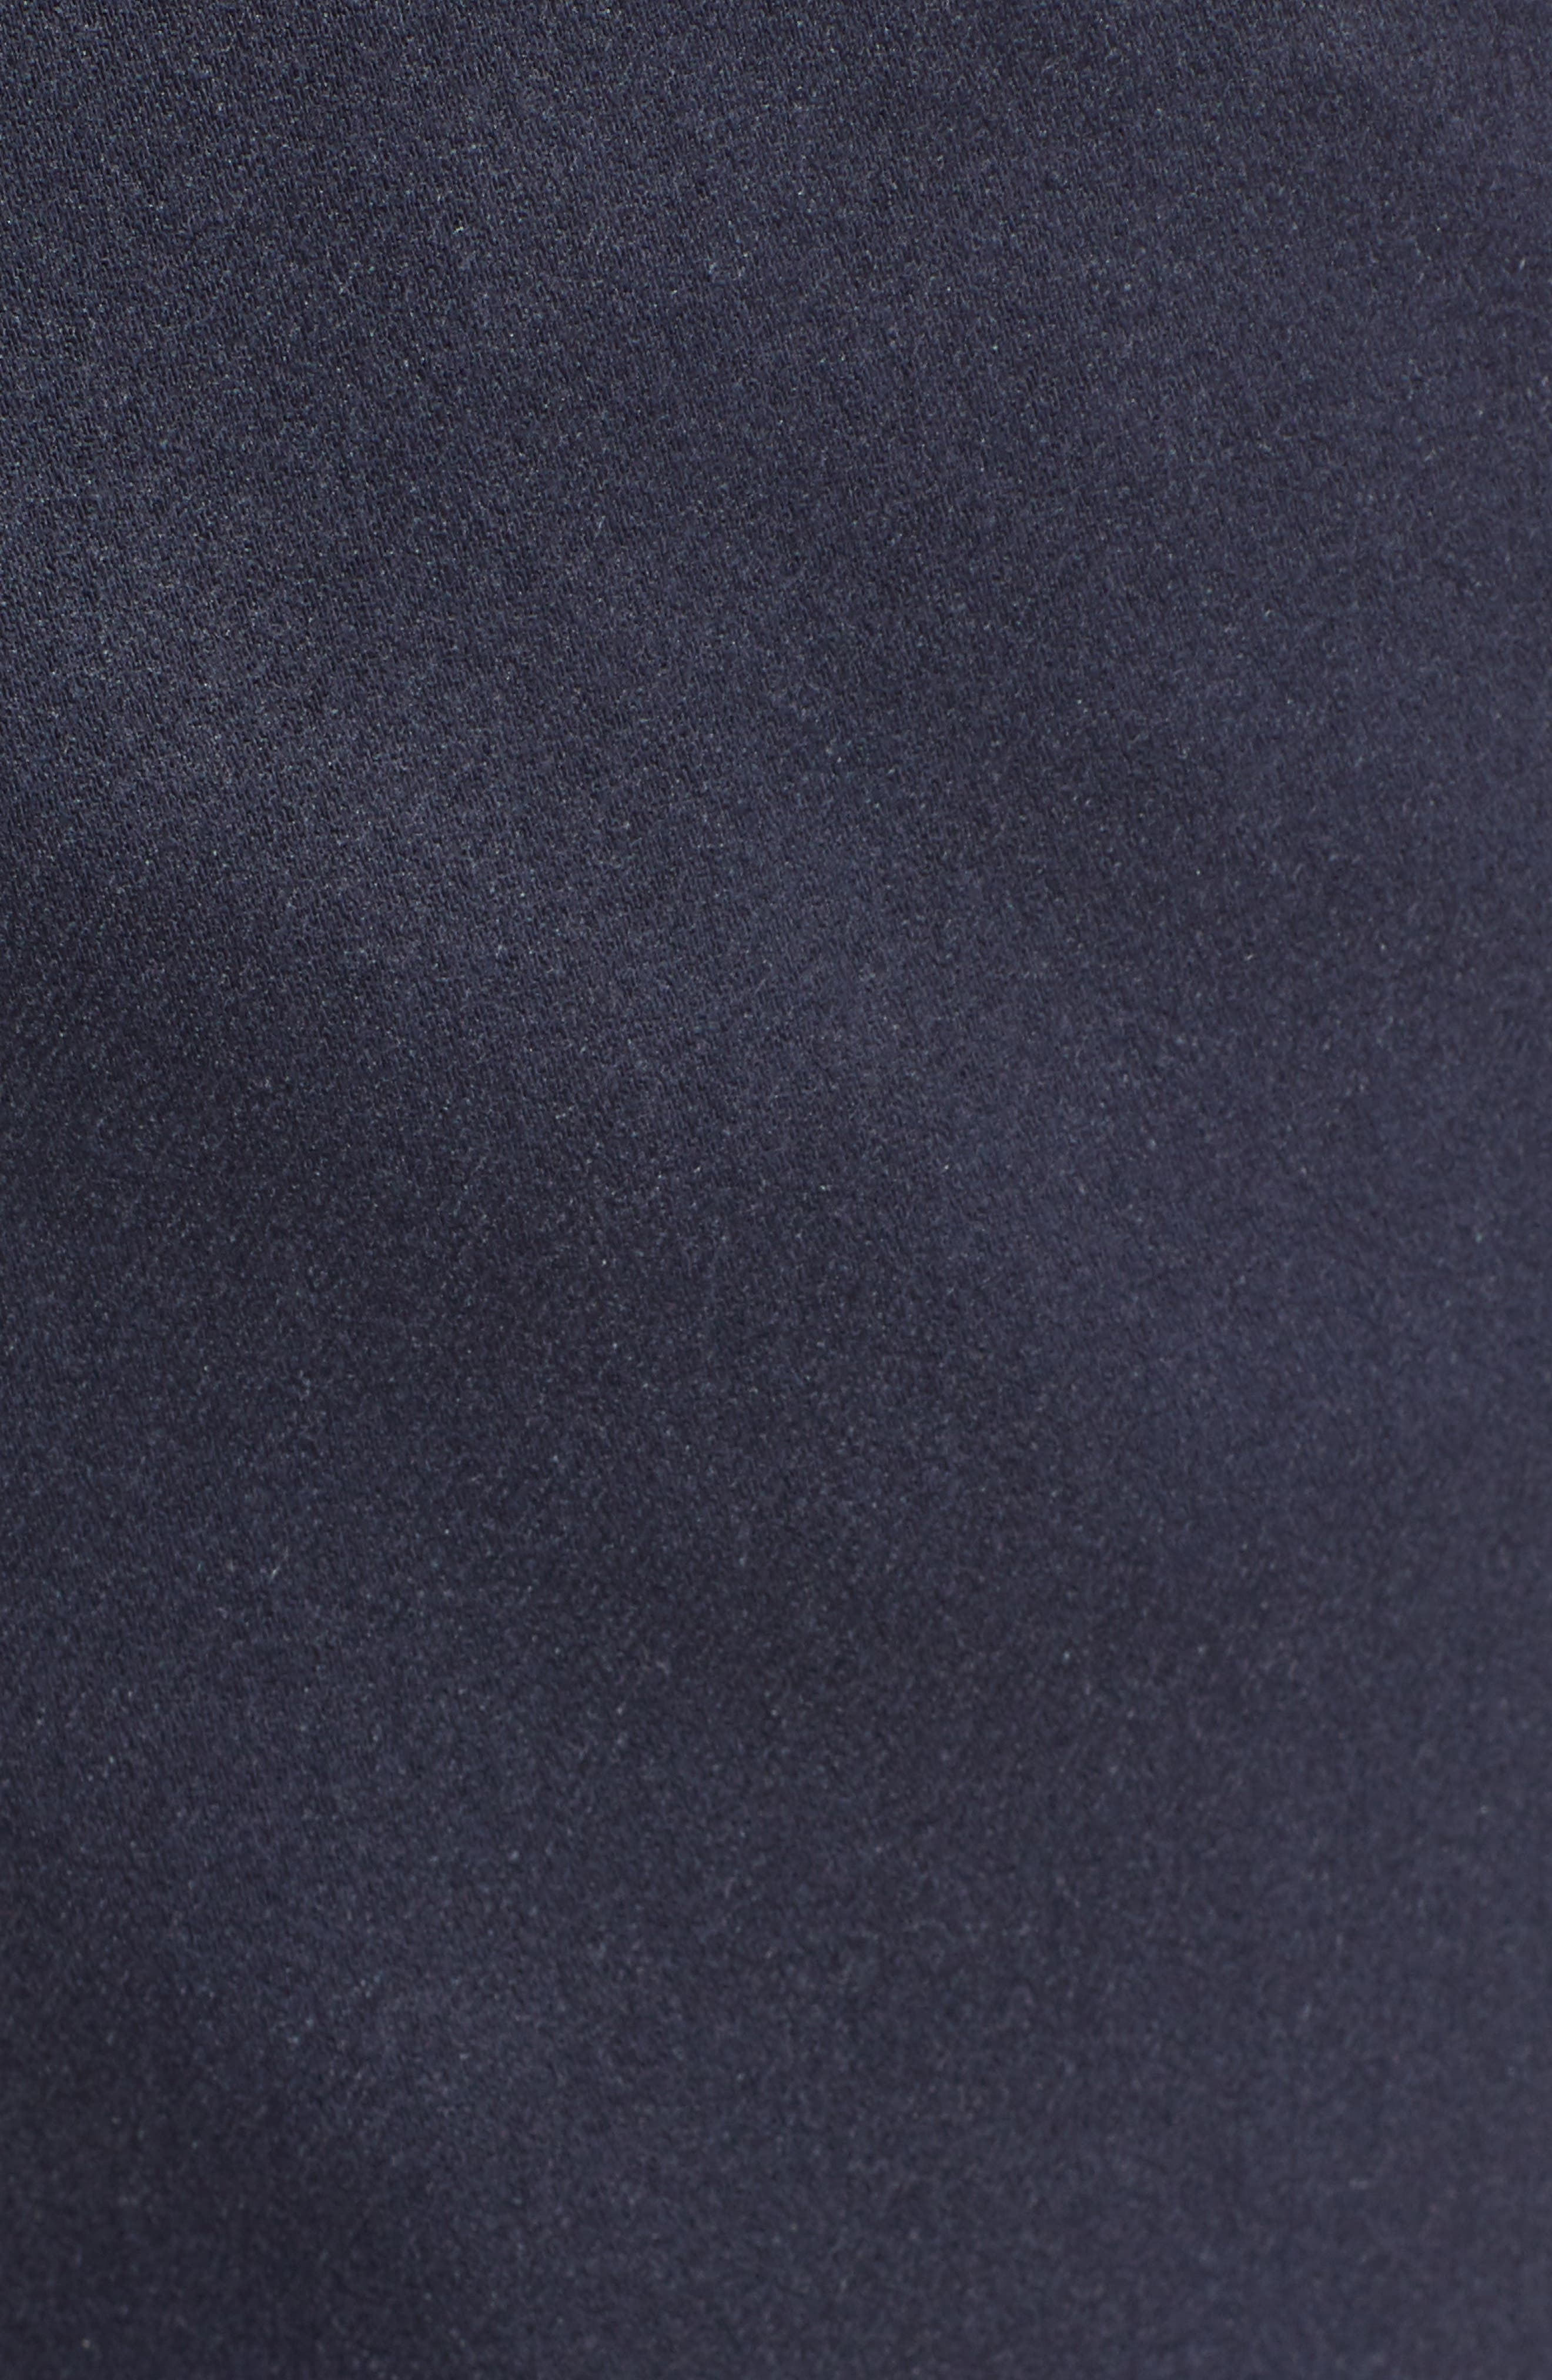 Transcend - Lennox Slim Fit Jeans,                             Alternate thumbnail 5, color,                             NIGHTFALL COATED